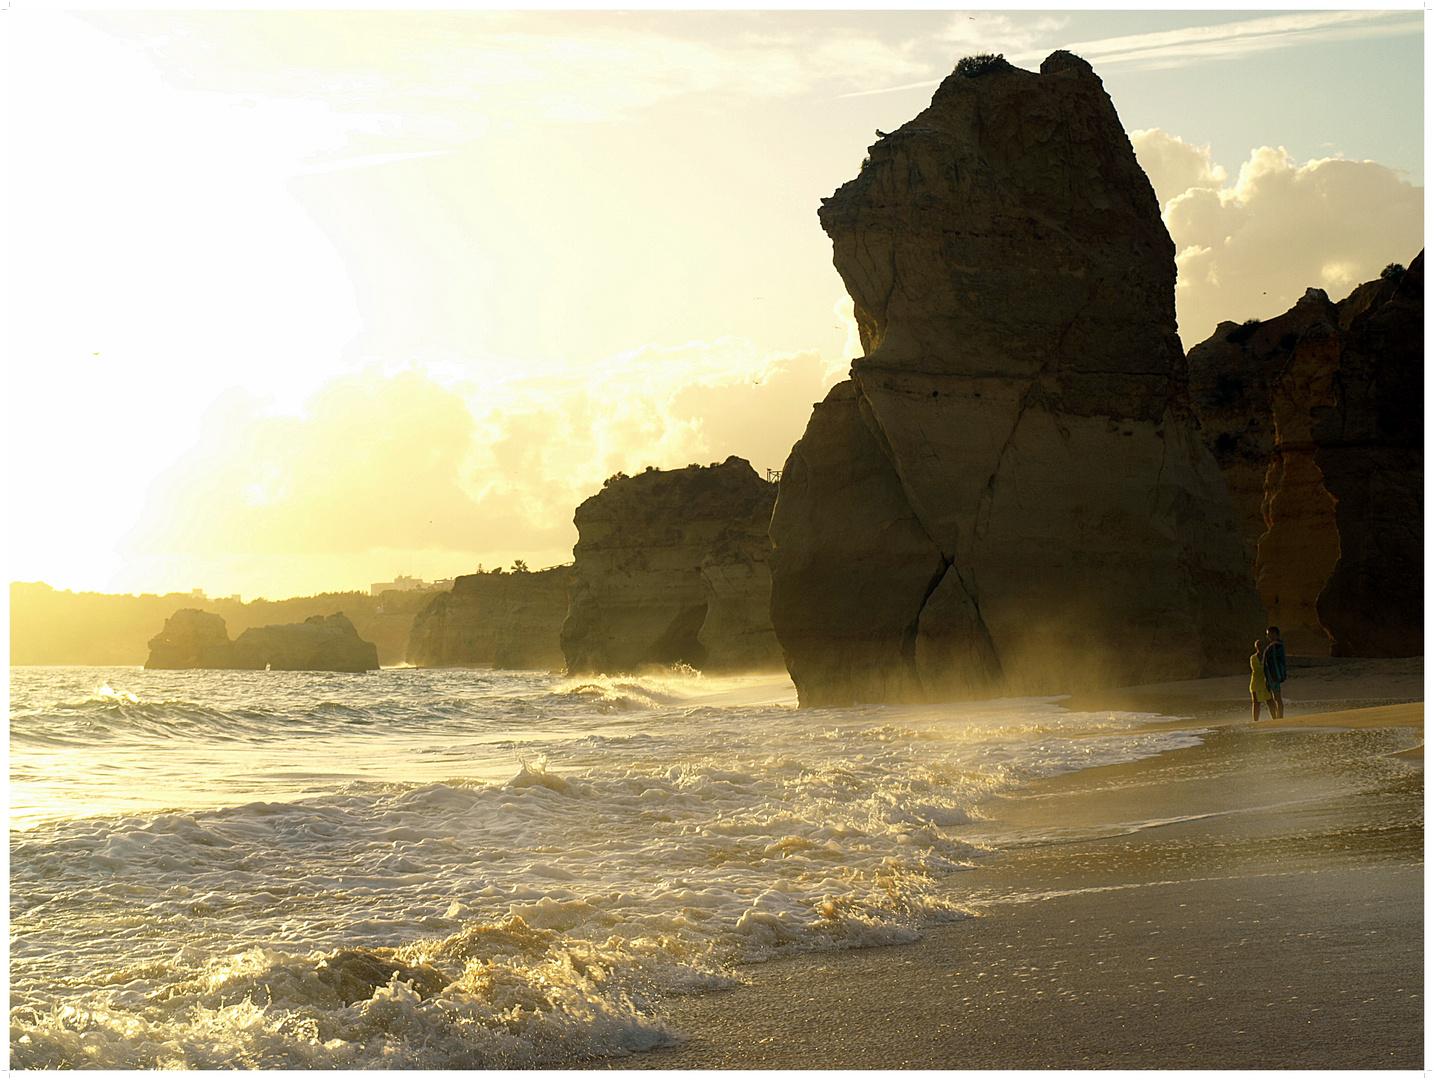 Sunset - Praia da Rocha I